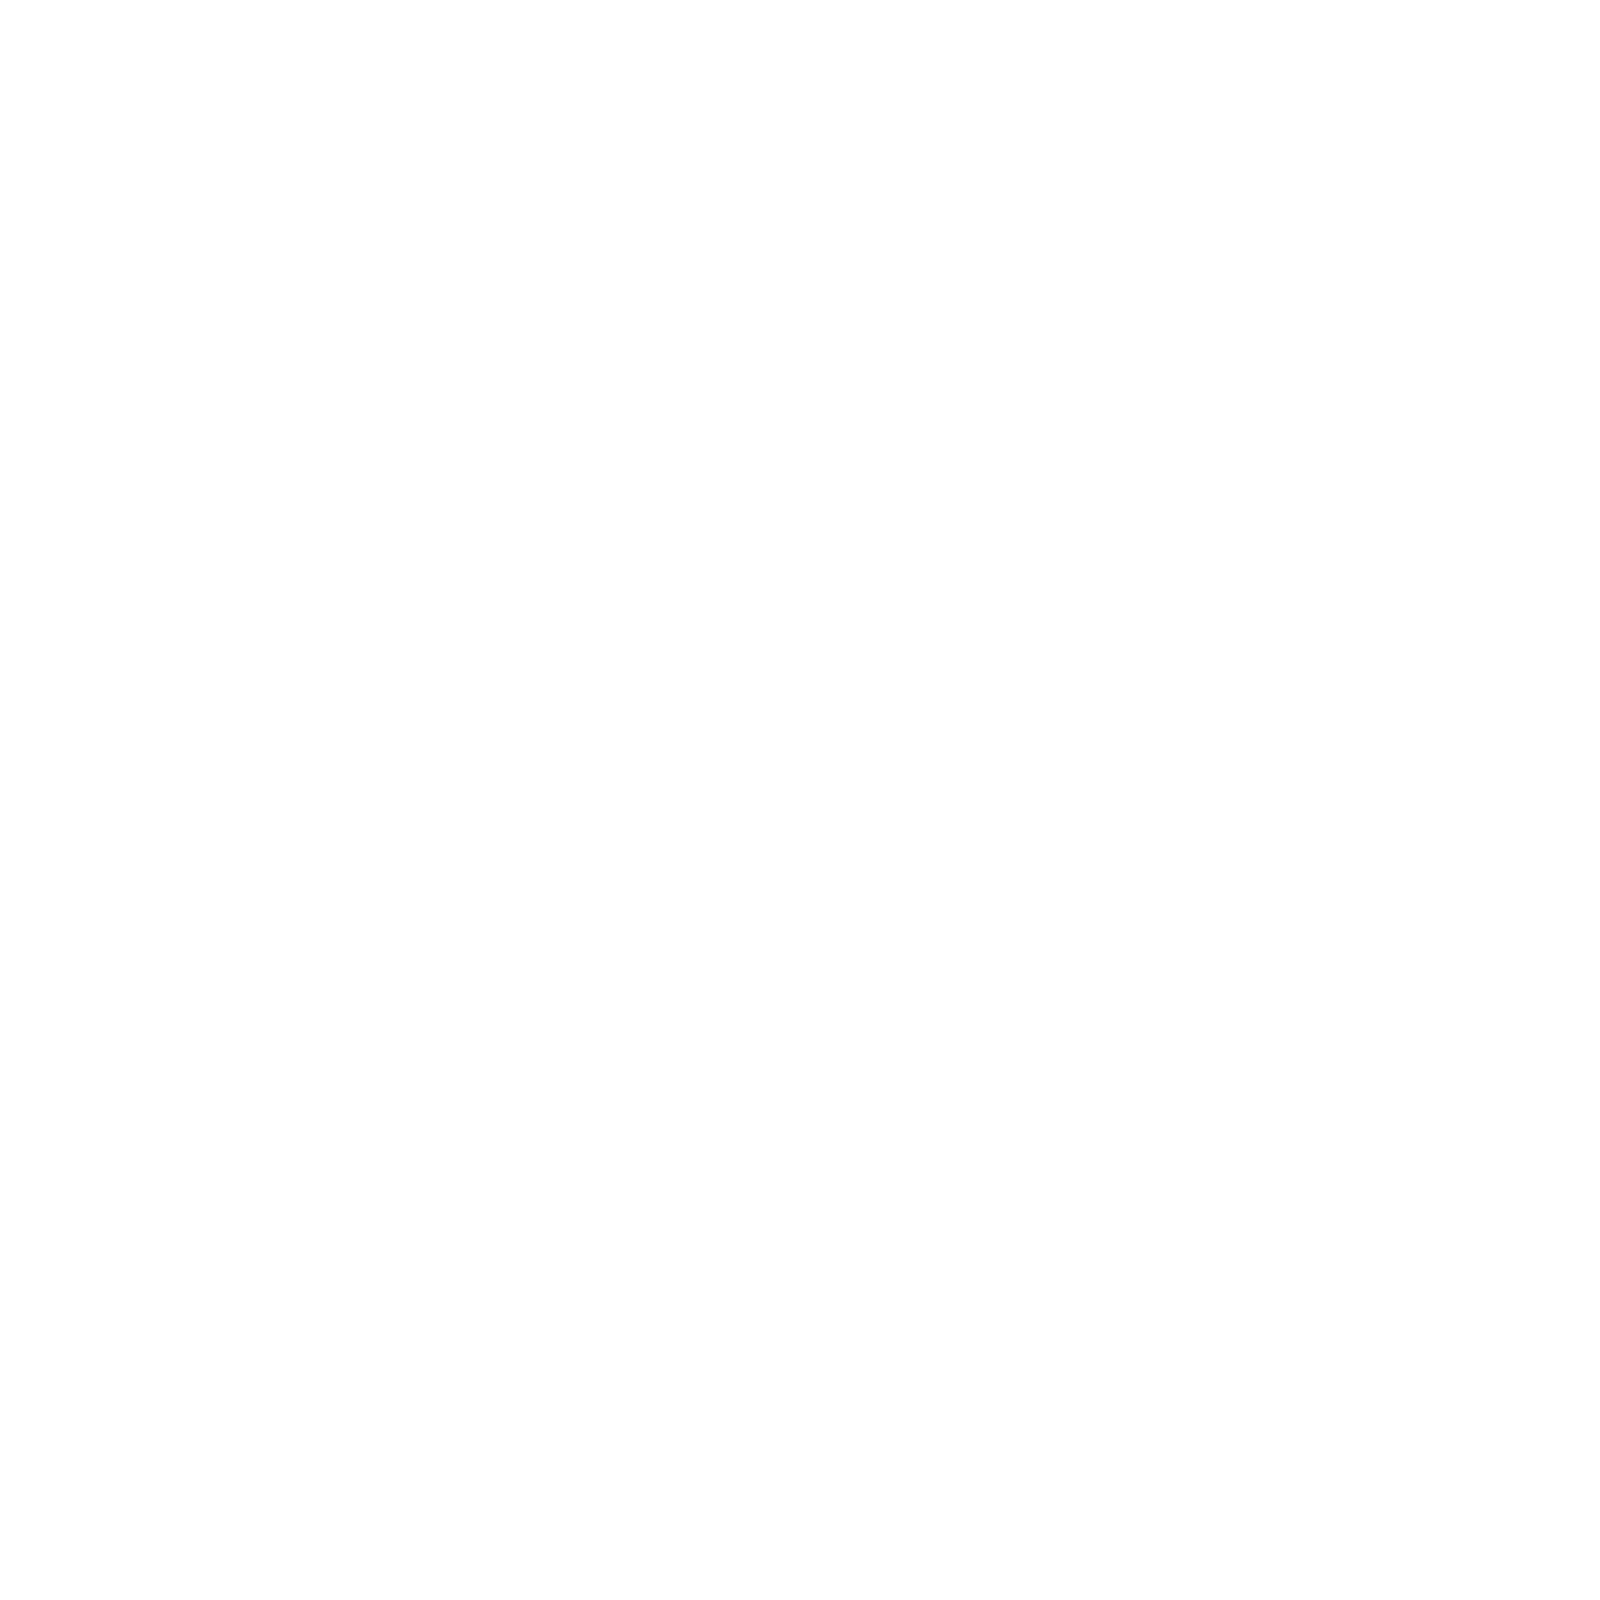 Fuschsia Project Logo Transparant